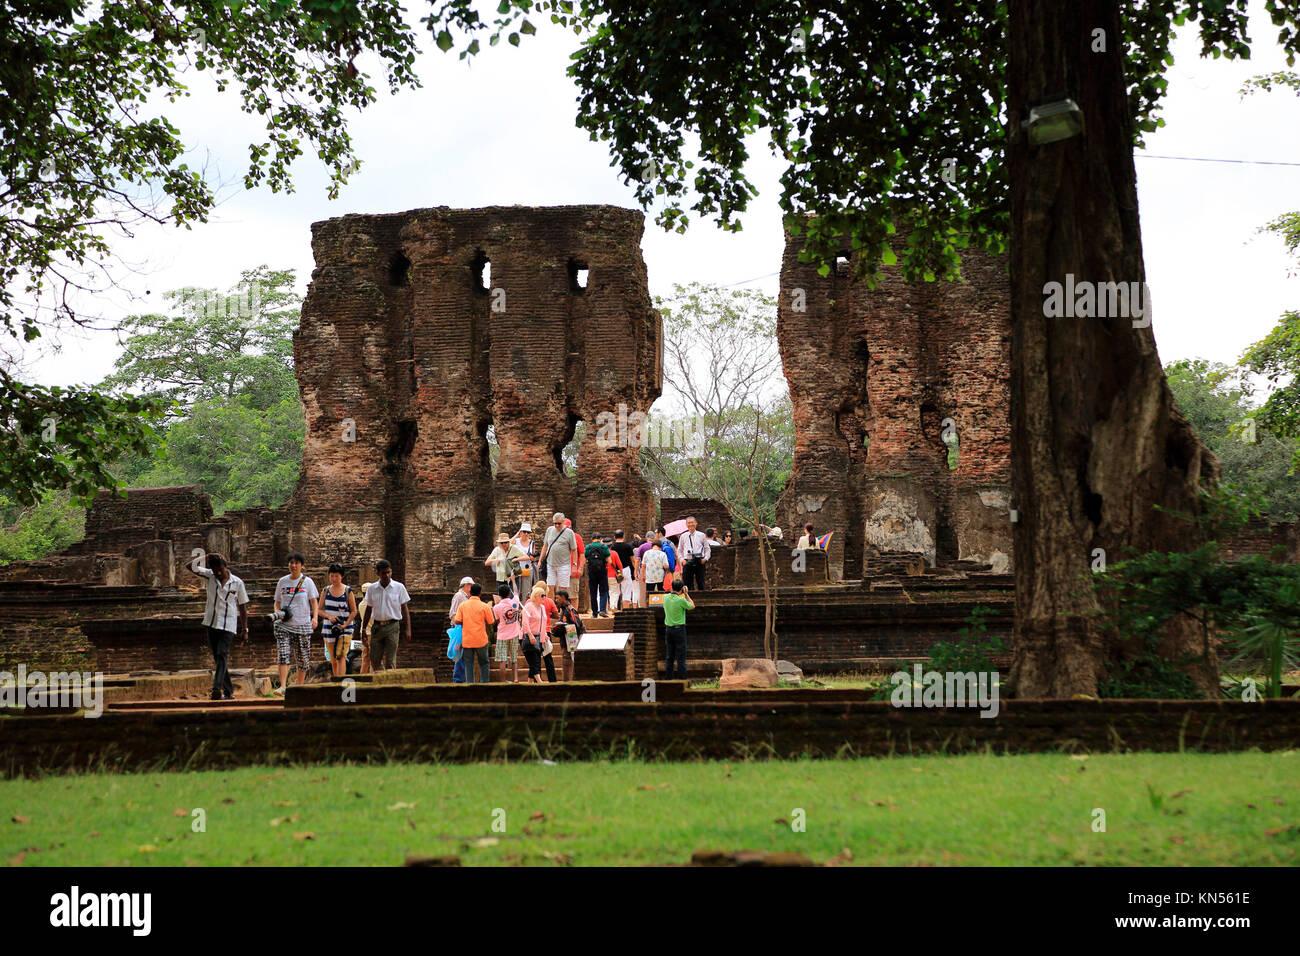 Royal Palace, Citadel, UNESCO World Heritage Site, the ancient city of Polonnaruwa, Sri Lanka, Asia - Stock Image